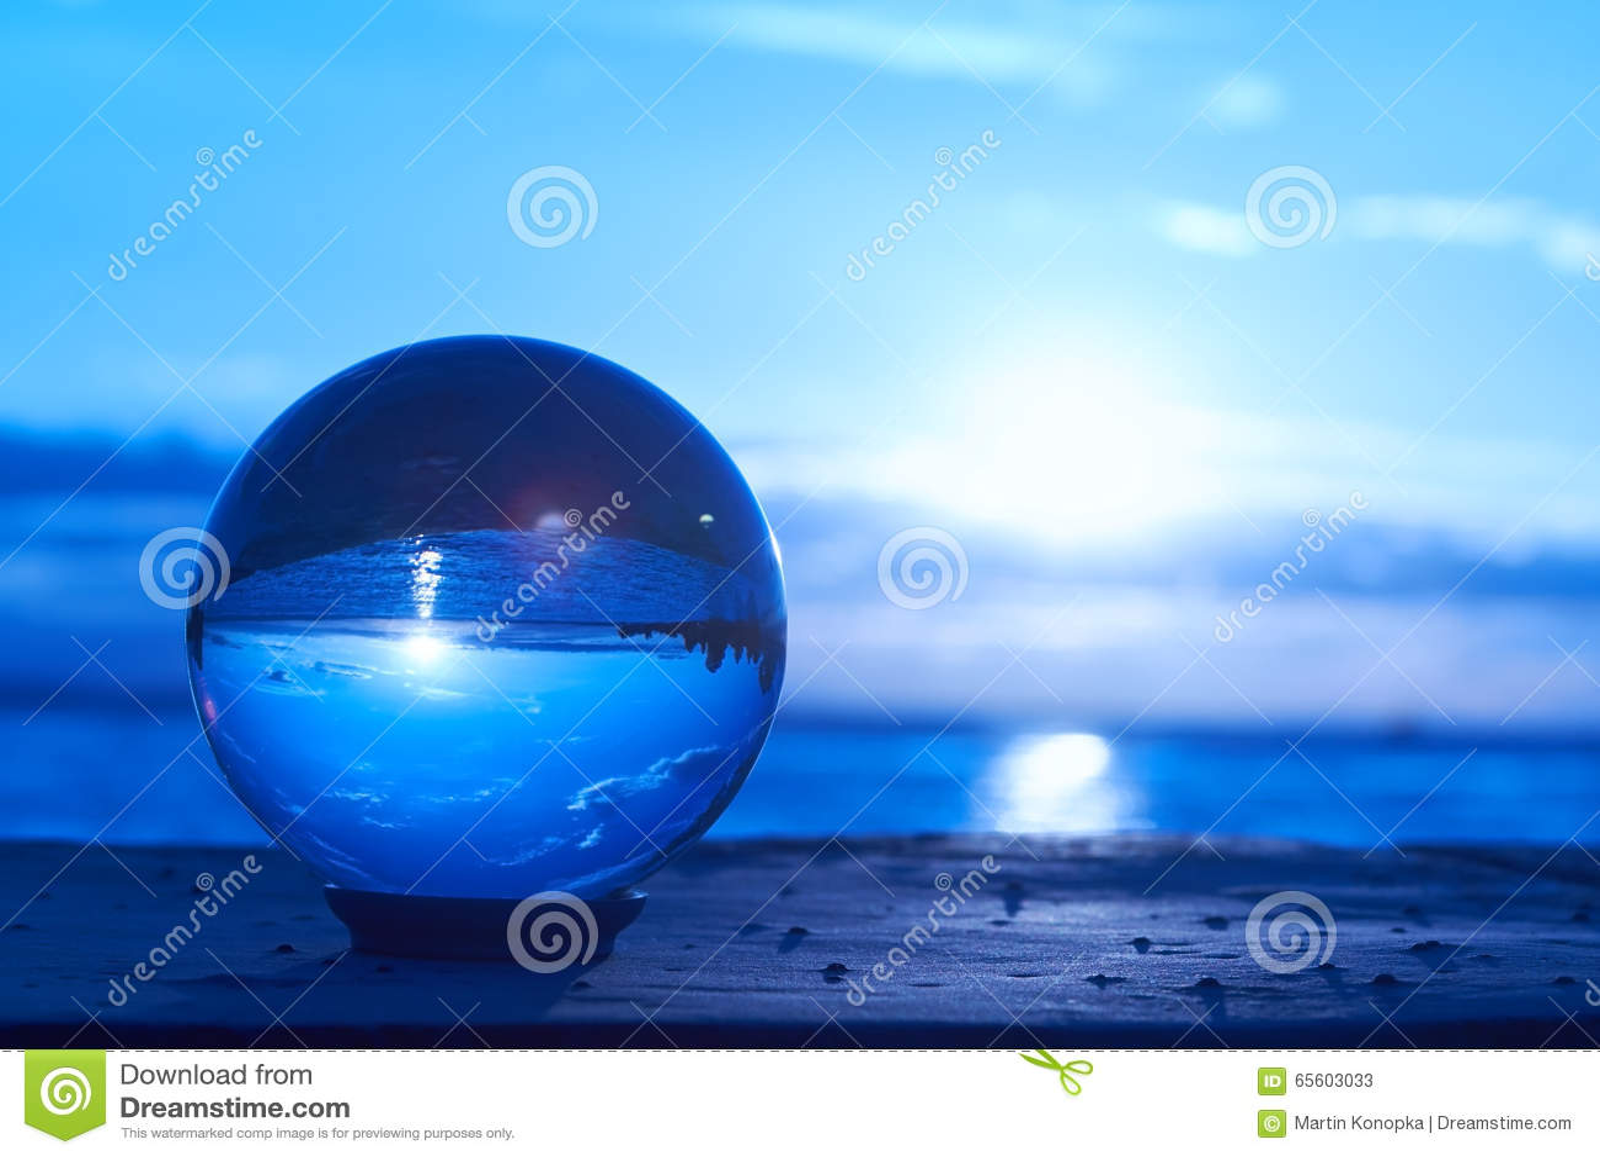 https://thumbs.dreamstime.com/z/crystal-ball-sun-sets-over-lake-constance-germany-lit-65603033.jpg